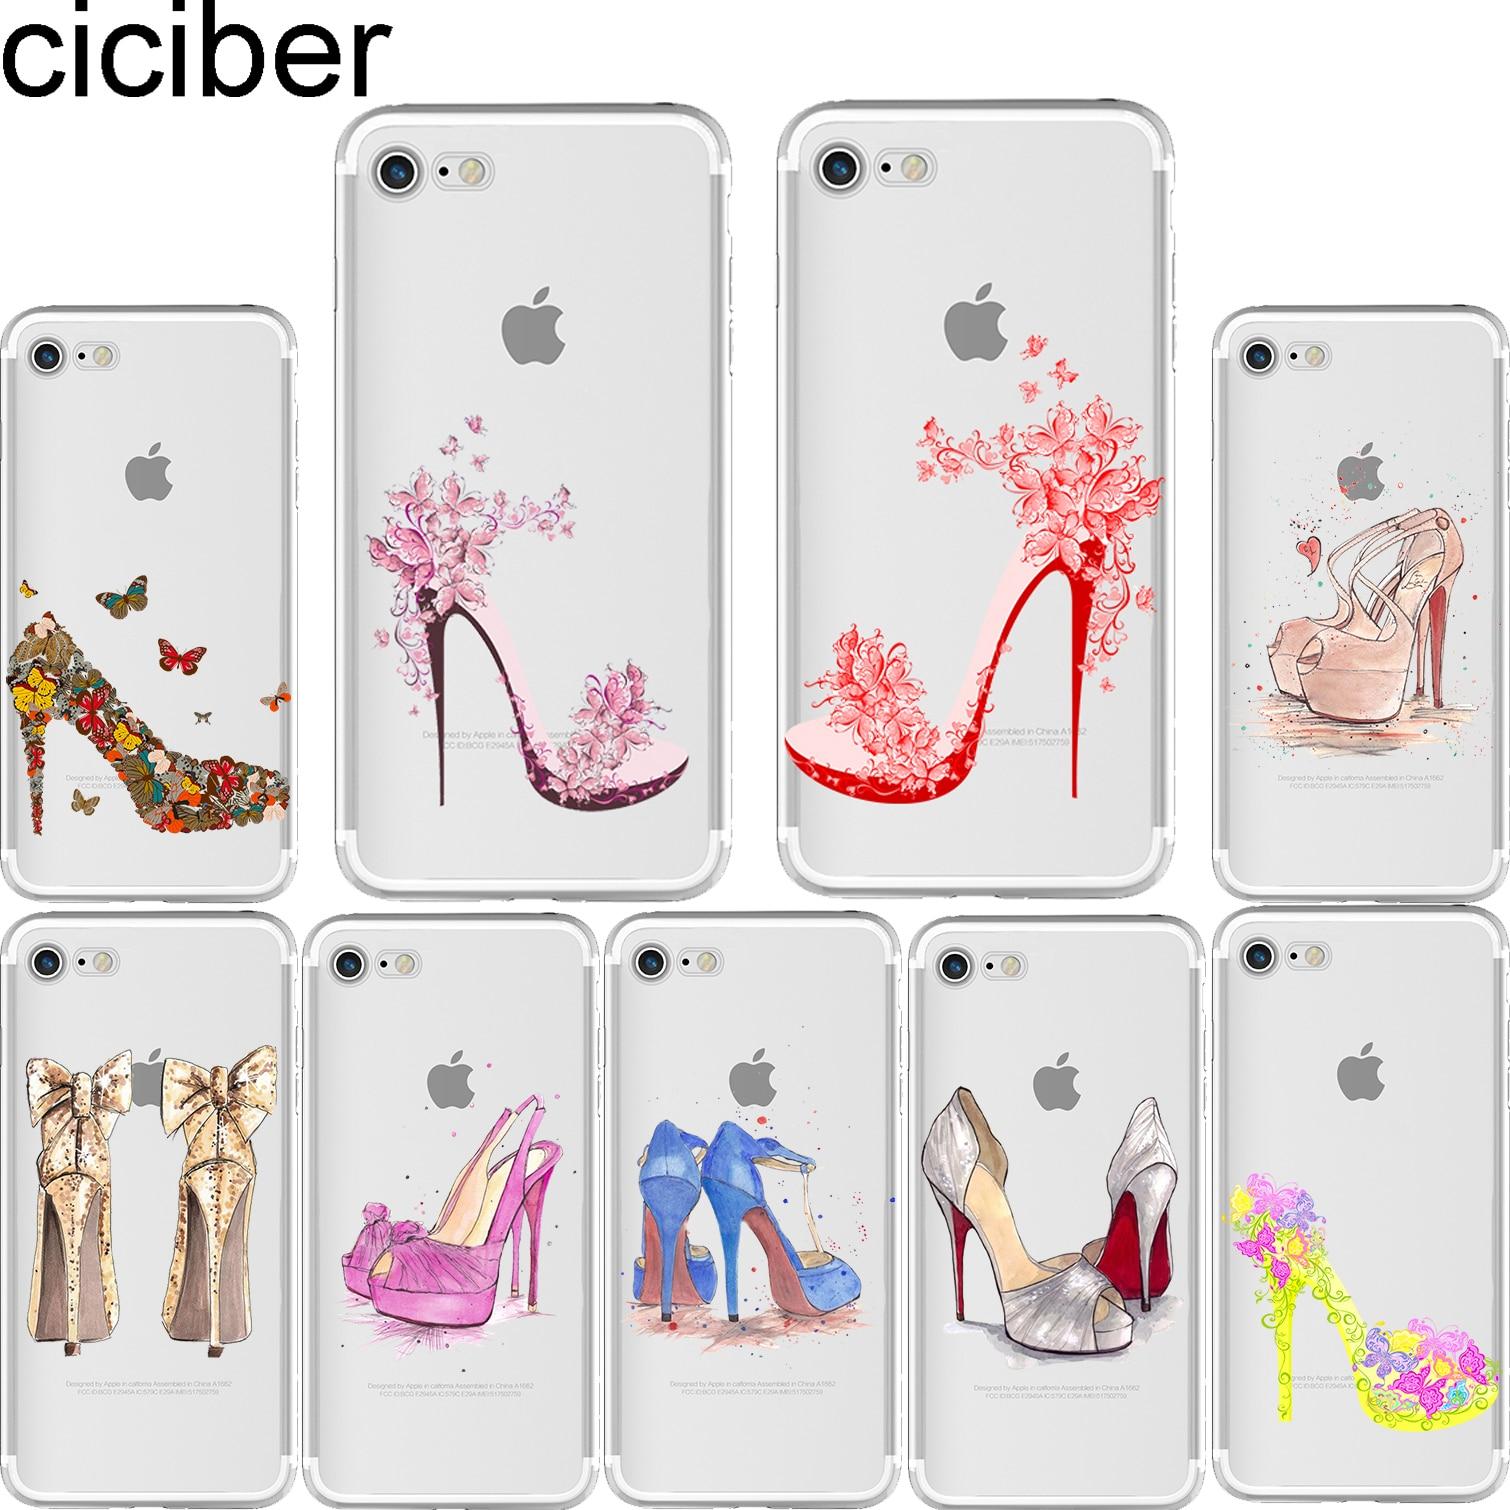 Ciciber Cantik Sepatu Hak Tinggi Pola Lembut Silicon Telepon Kasus Cover untuk IPhone 6 6 S 7 8 Ditambah 5 S SE X Capinha Fundas Coque di Dilengkapi Kasus